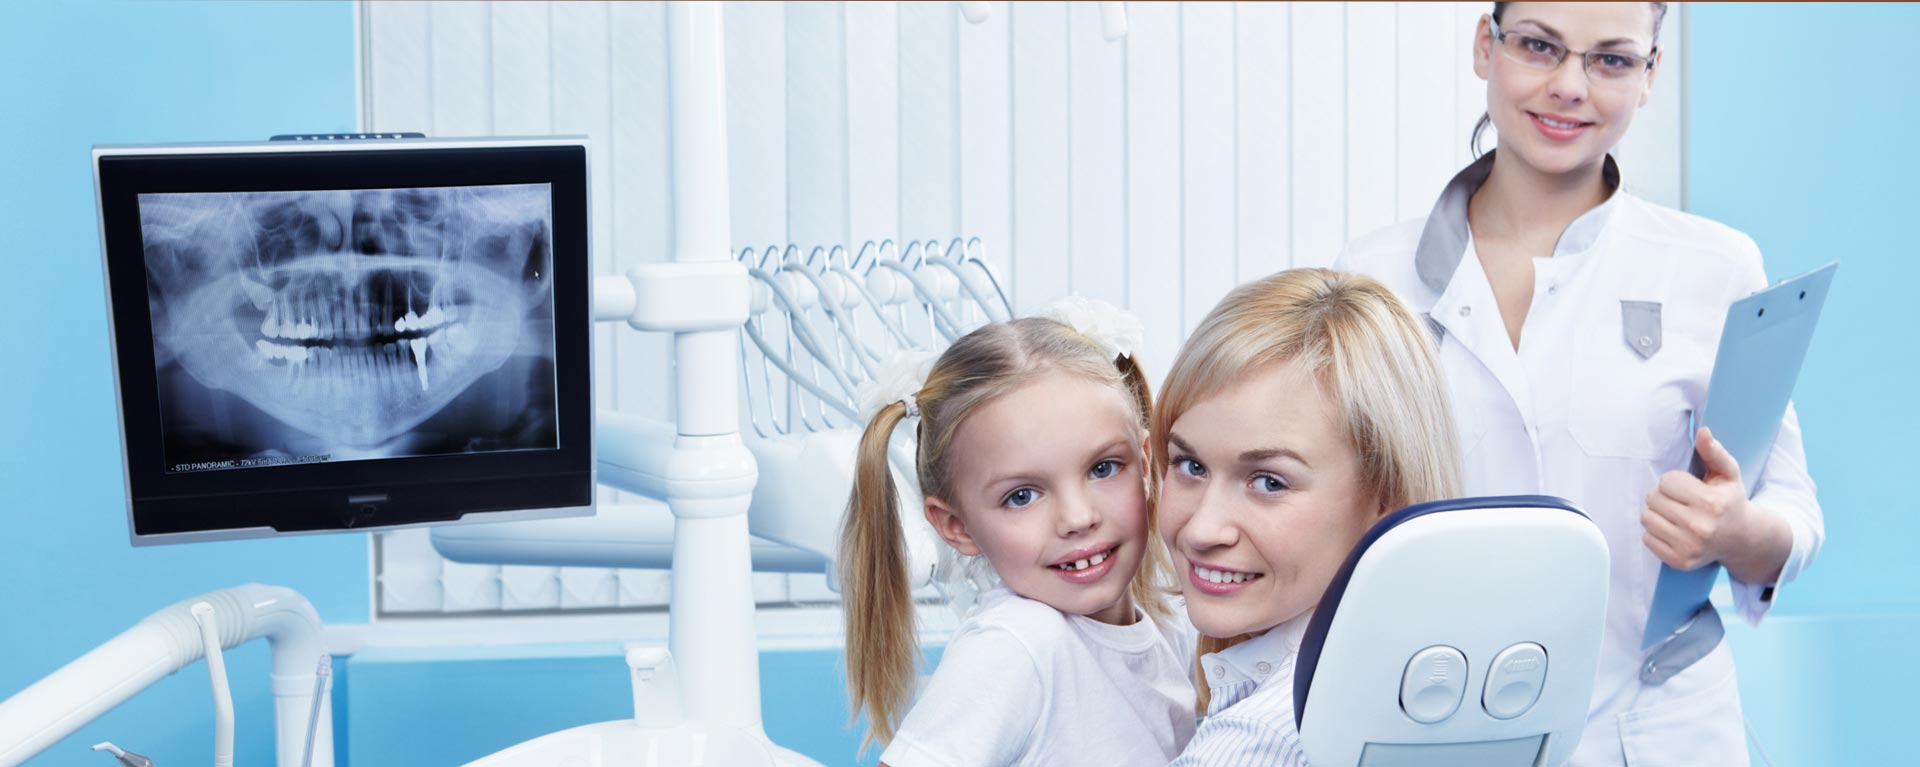 Etobicoke Dentist - West Metro Dental Services Page Background